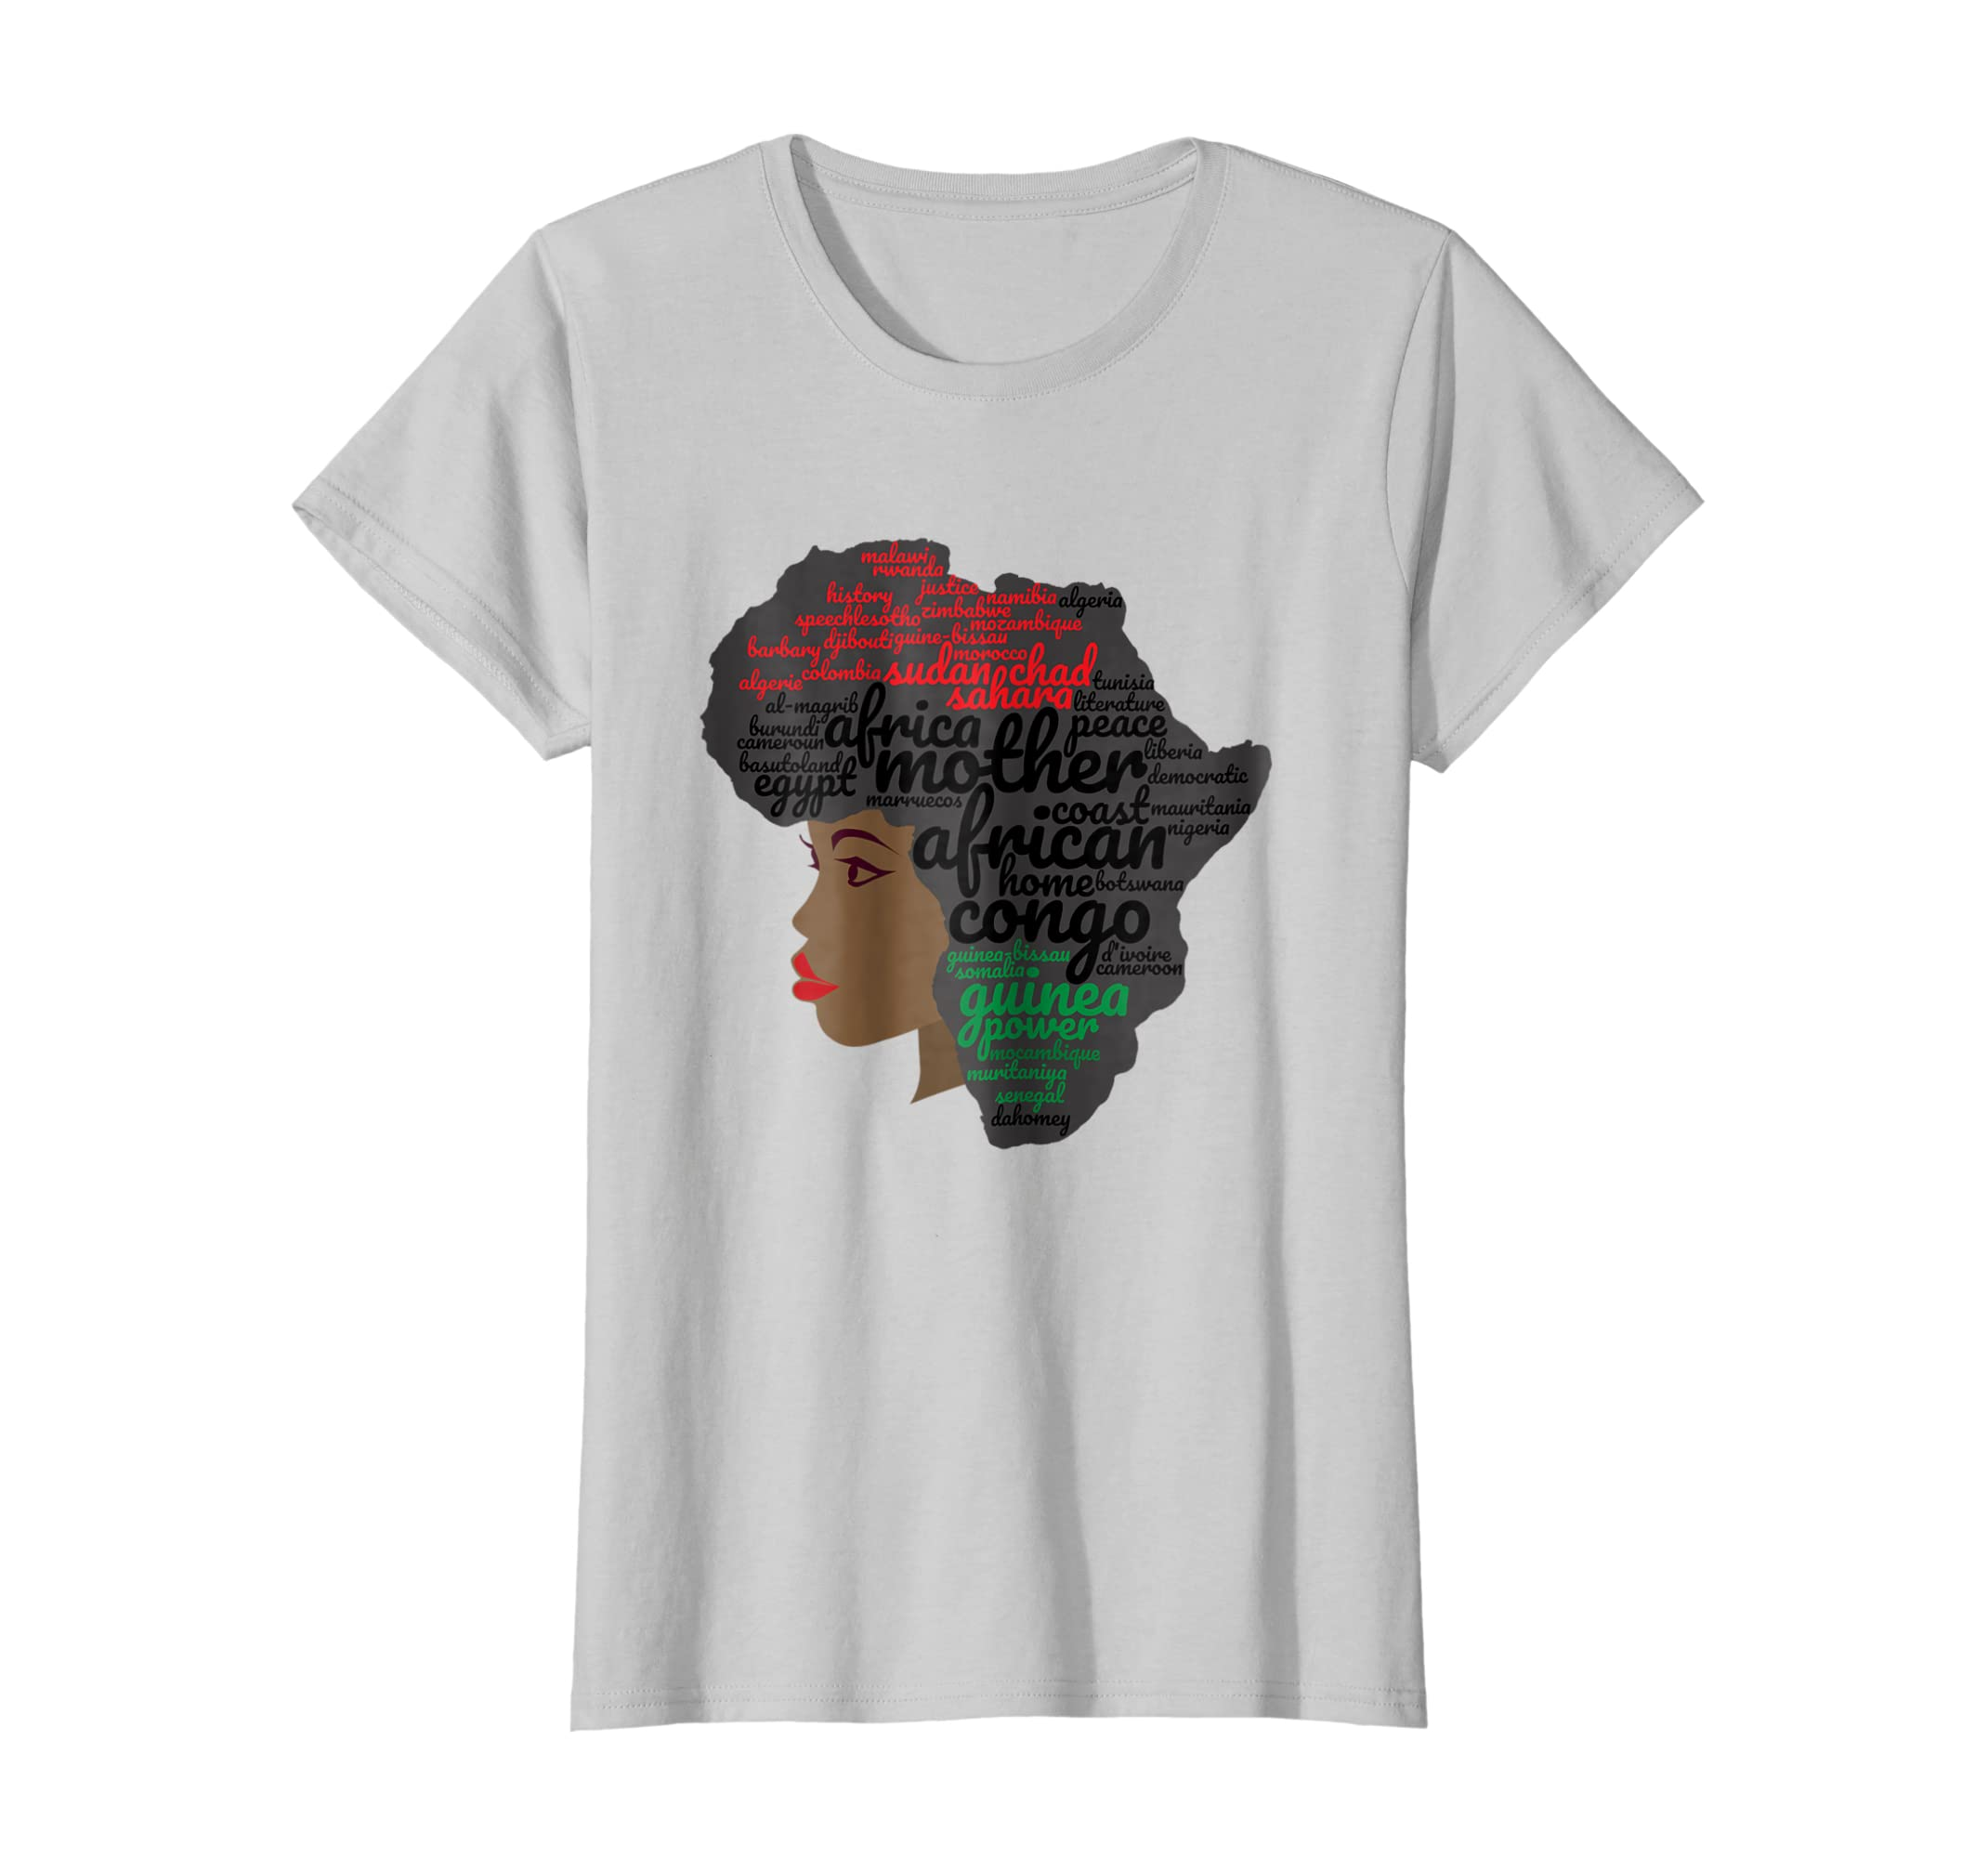 32b4e730a Amazon.com: Afro Word Art Natural Hair T-Shirt for Black Women: Clothing